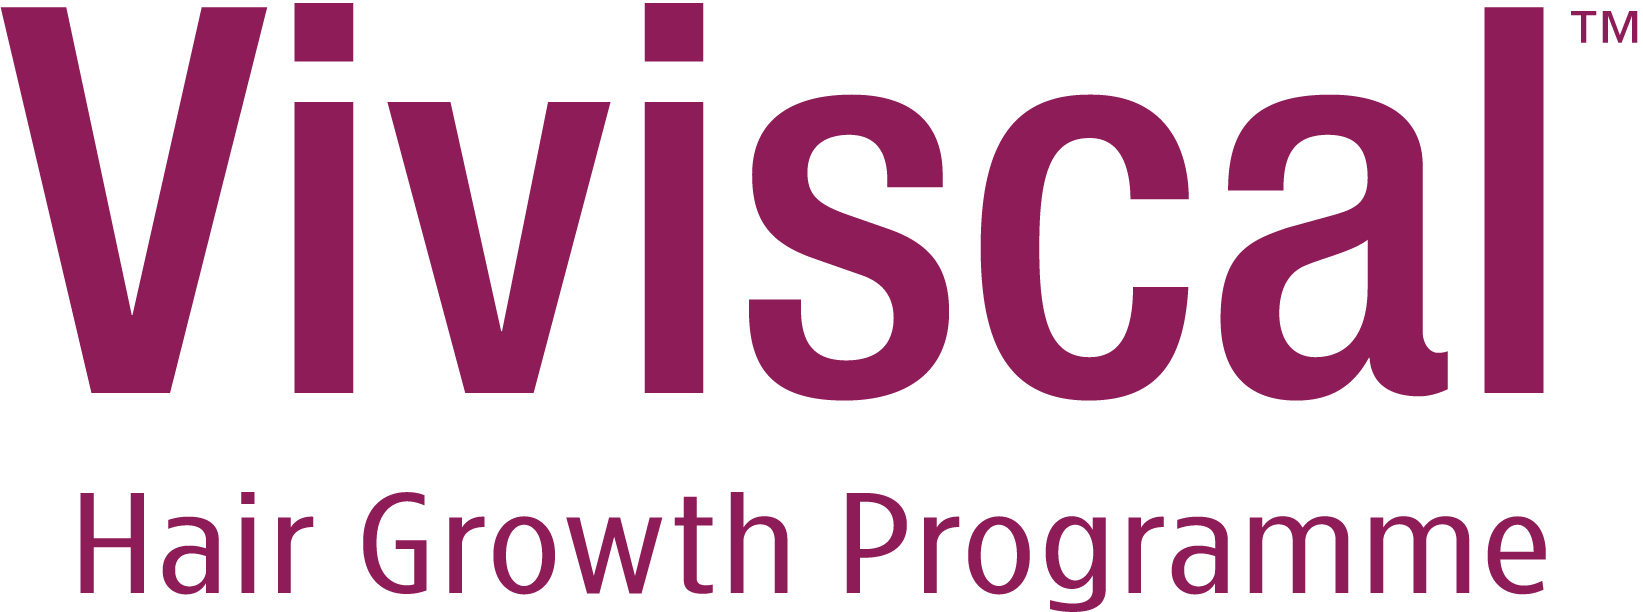 Vivsical Hair Growth Programme Logo larger.jpg